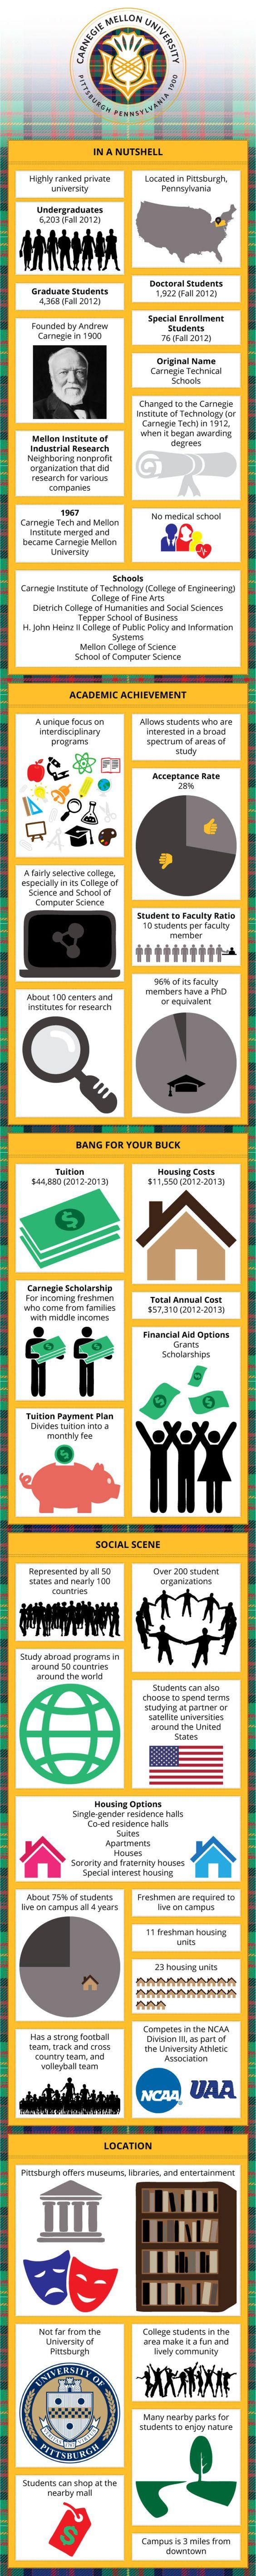 carnegie mellon university cmu infographic infographics carnegie mellon university cmu infographic